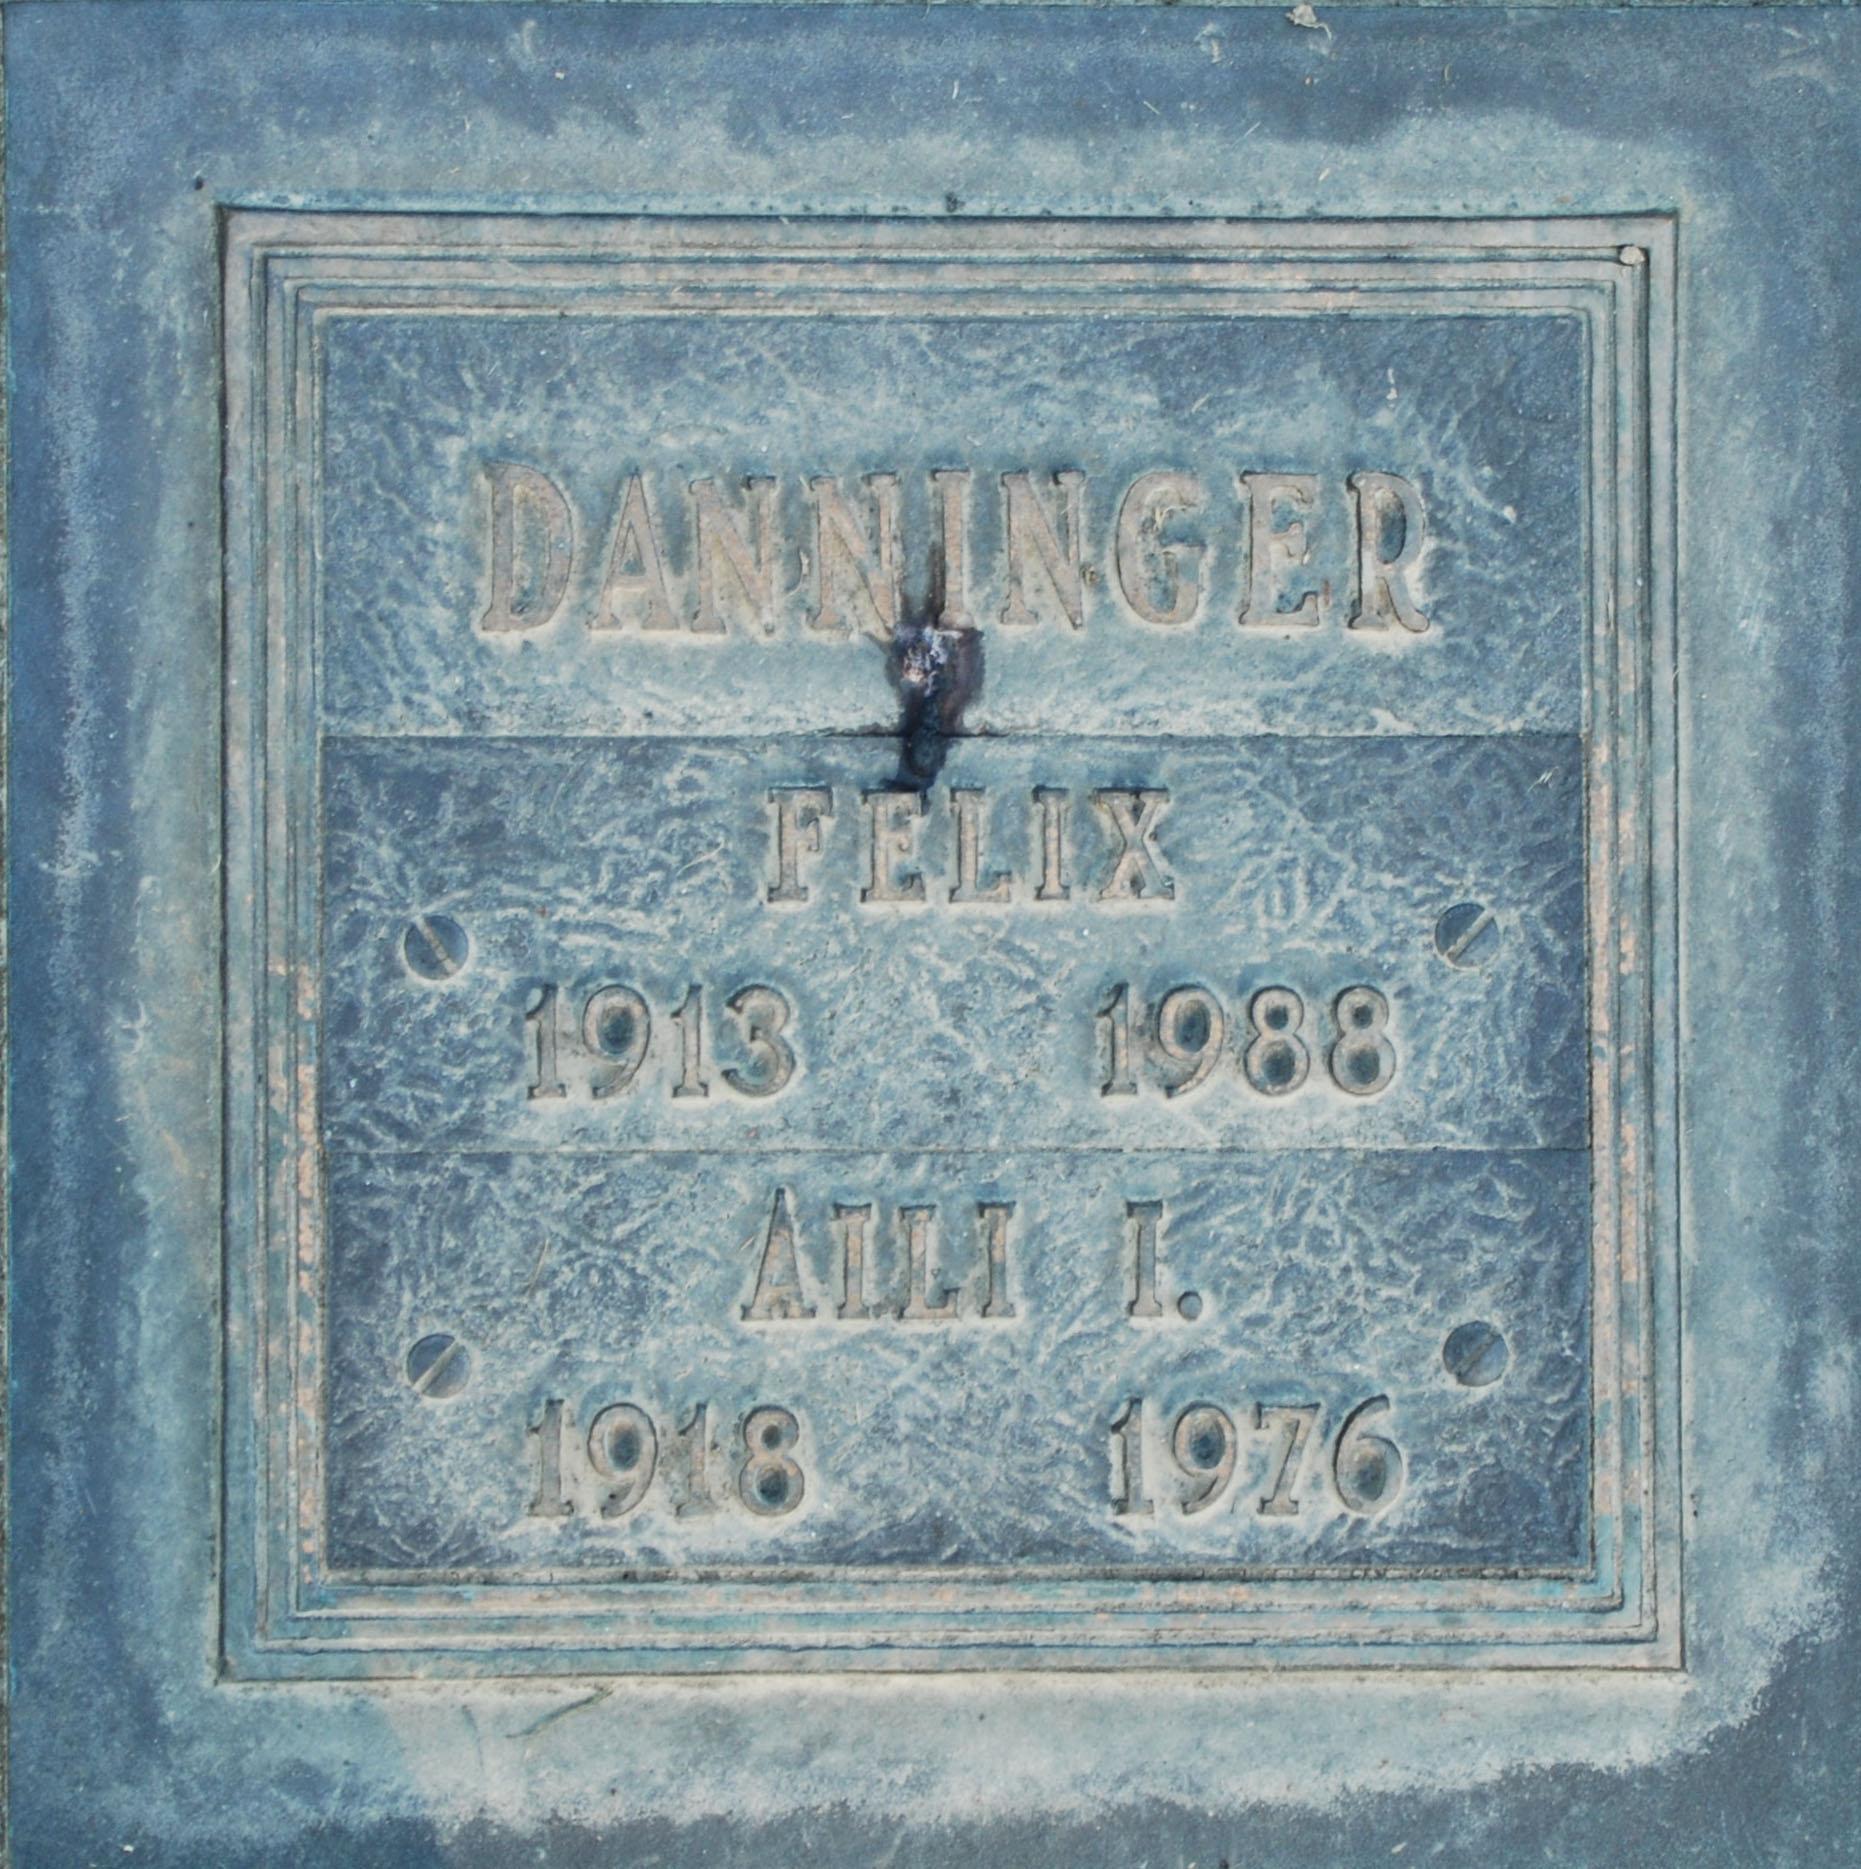 Felix Danninger